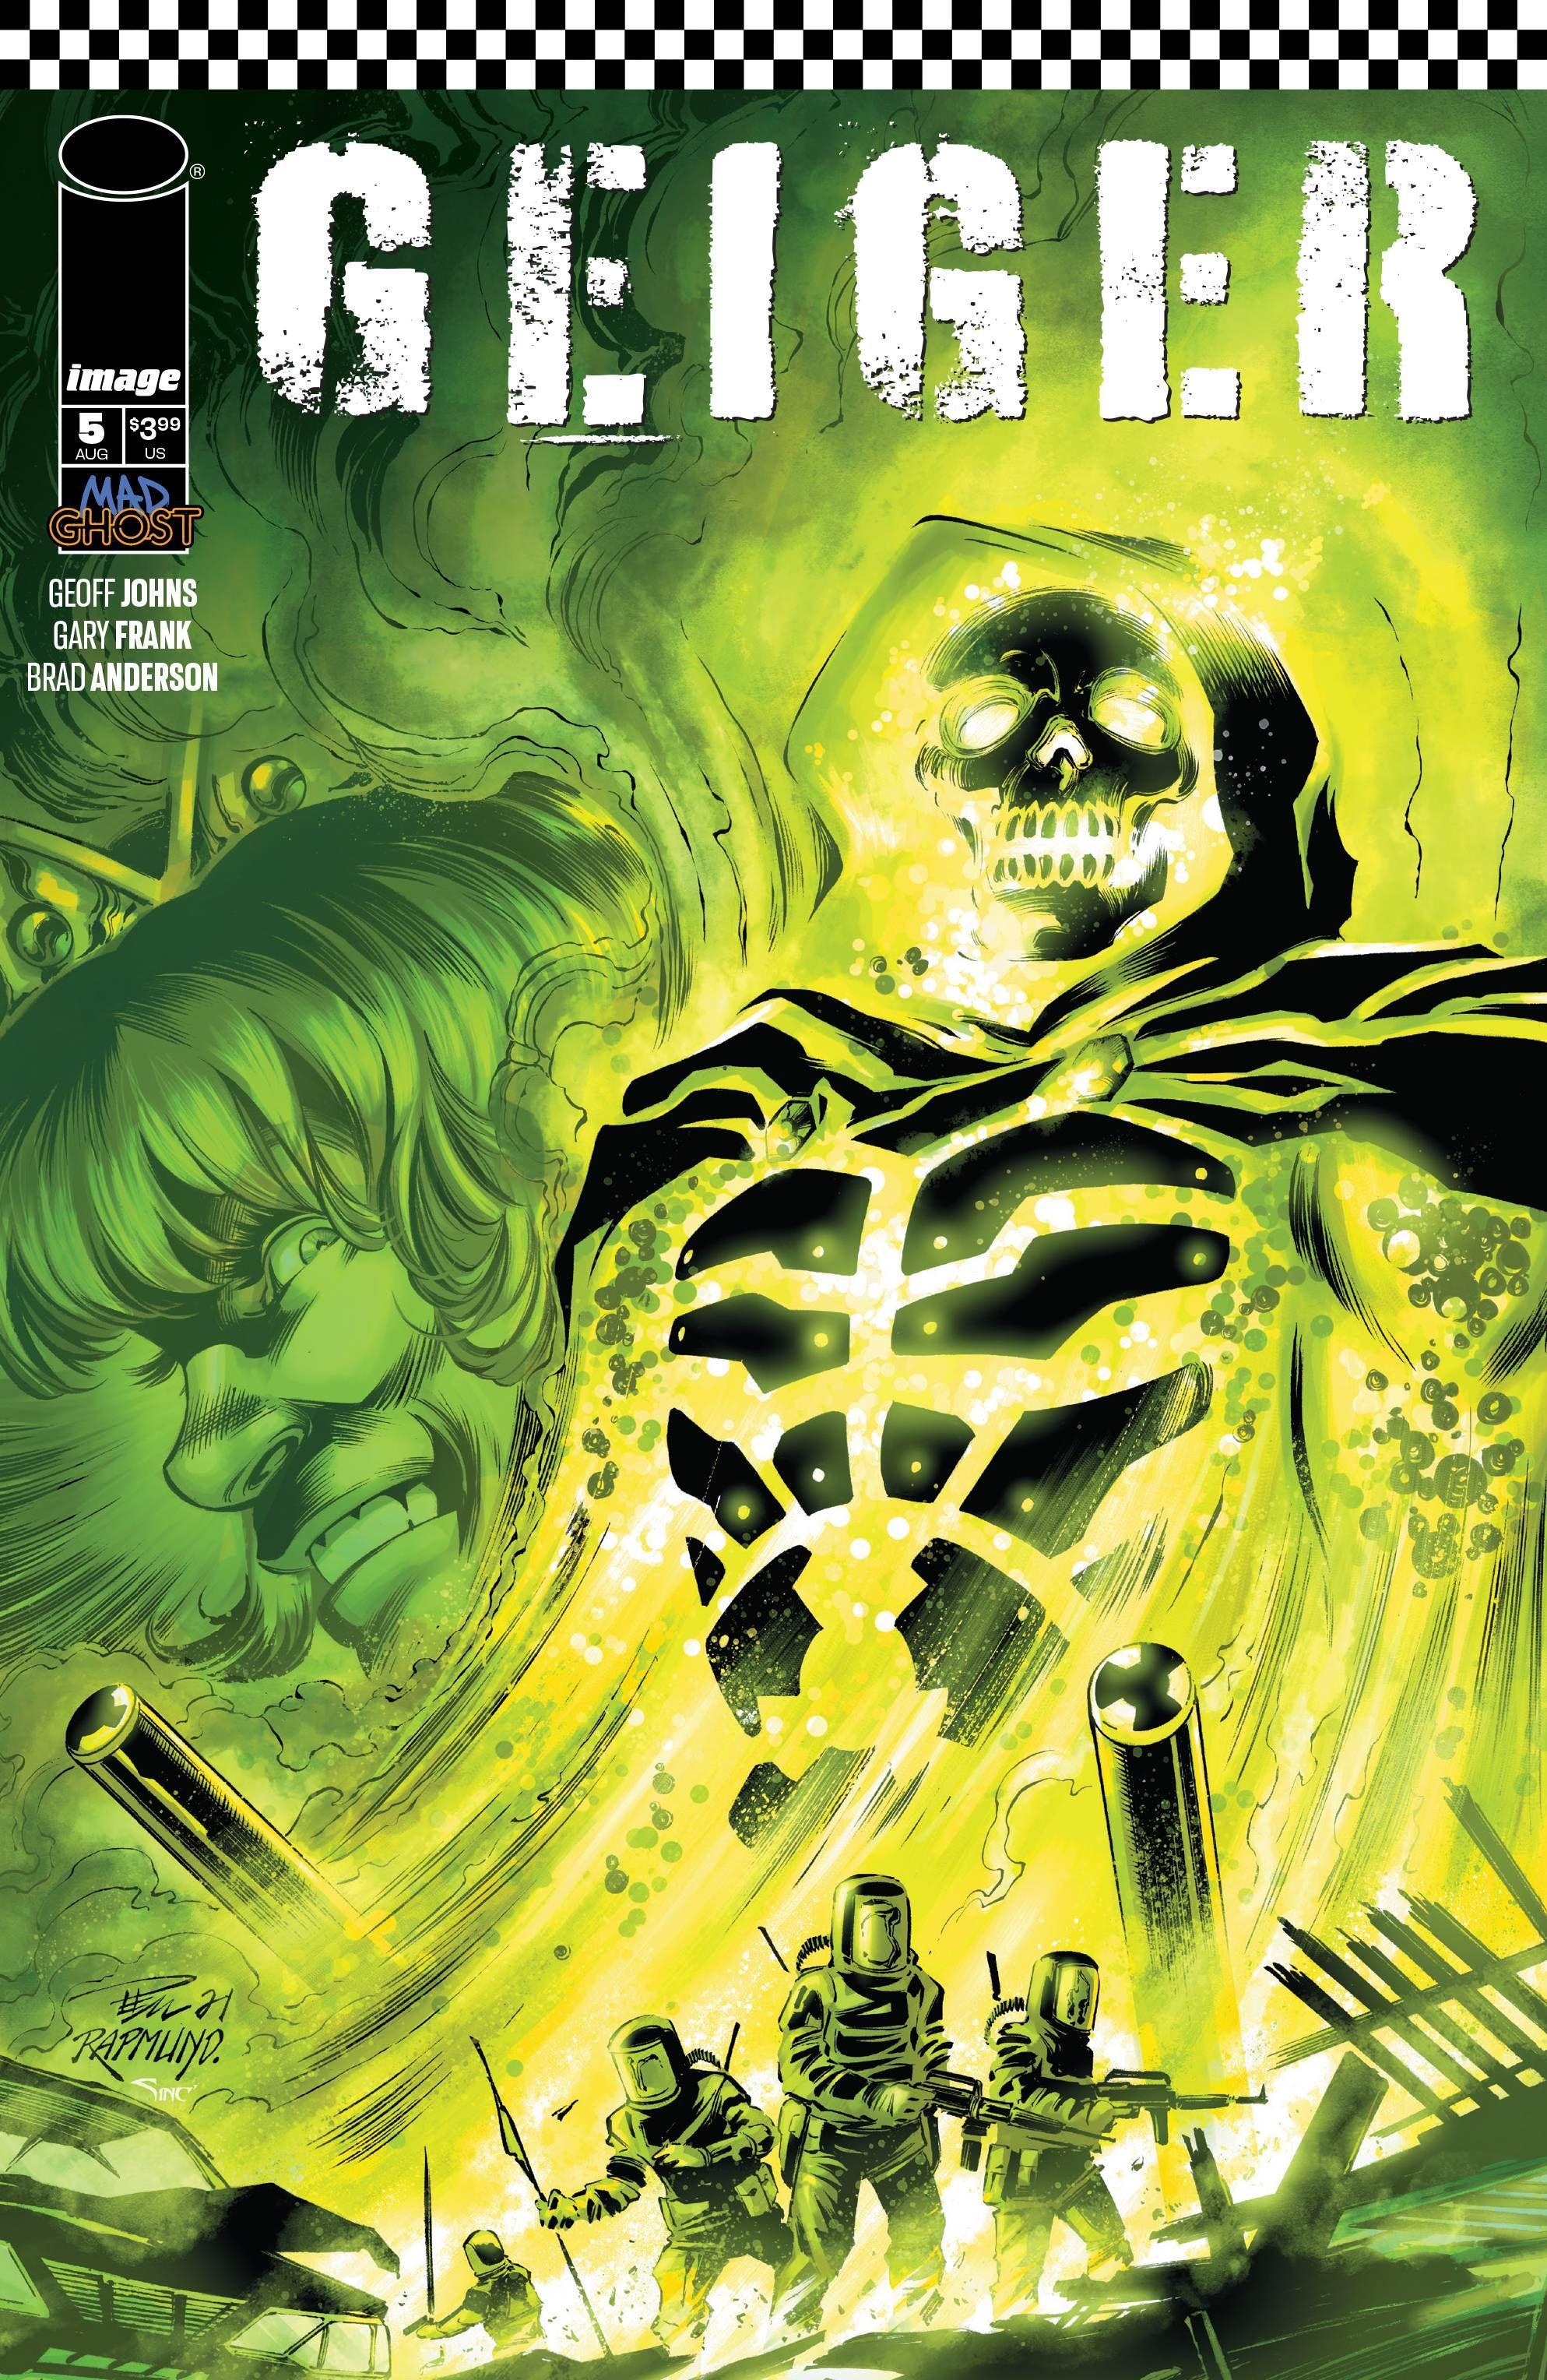 eyJidWNrZXQiOiJnb2NvbGxlY3QuaW1hZ2VzLnB1YiIsImtleSI6ImIyMDNjYWFkLWE3M2QtNDE4Ny04YjIxLTU0ZTNkNGQzNzlkZS5qcGciLCJlZGl0cyI6W119 ComicList: Image Comics New Releases for 08/04/2021